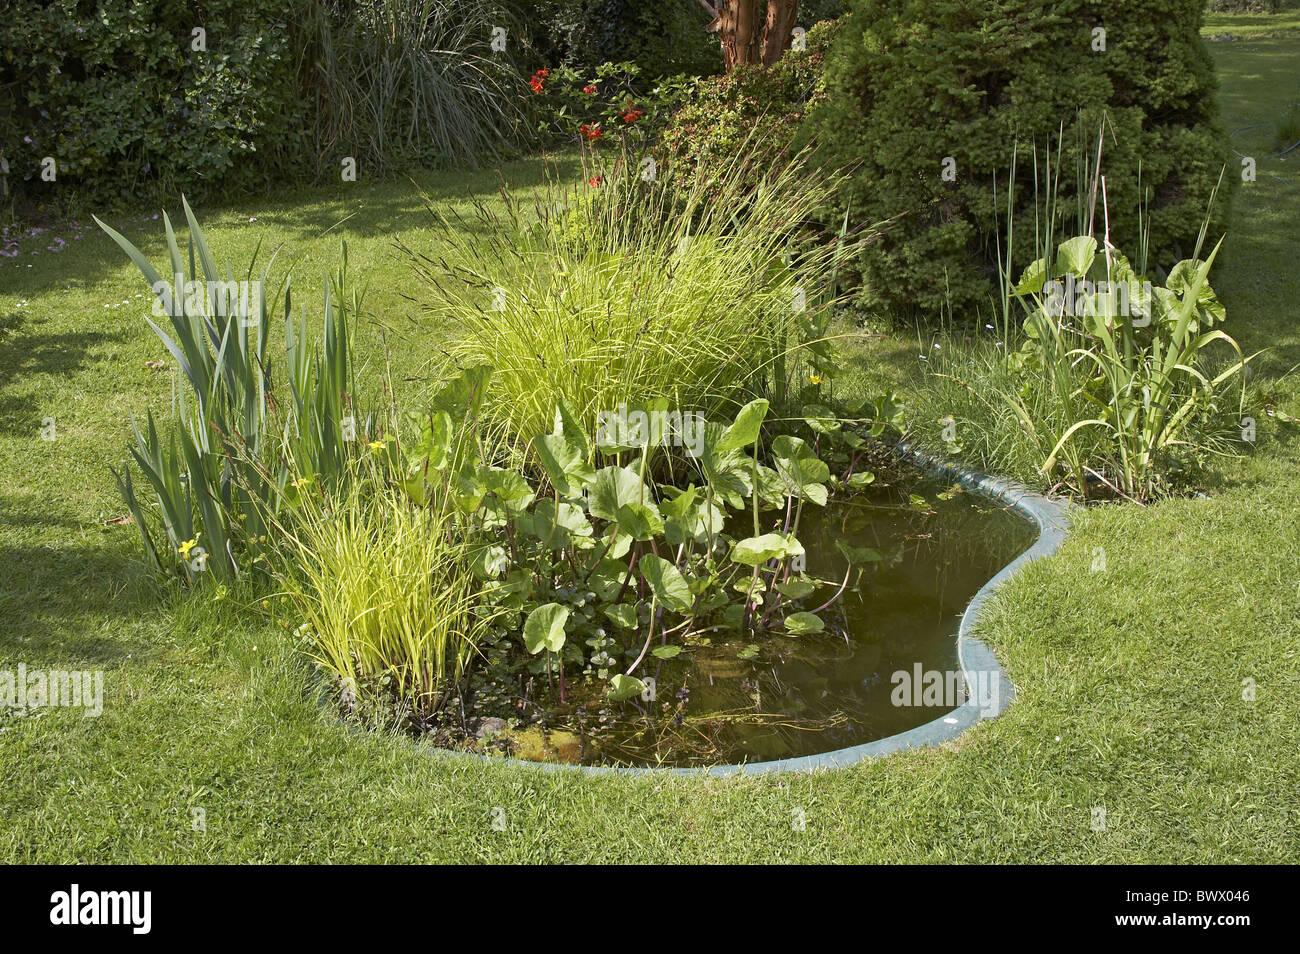 Garden wildlife pond preformed fibreglass pond stock photo for Preformed pond